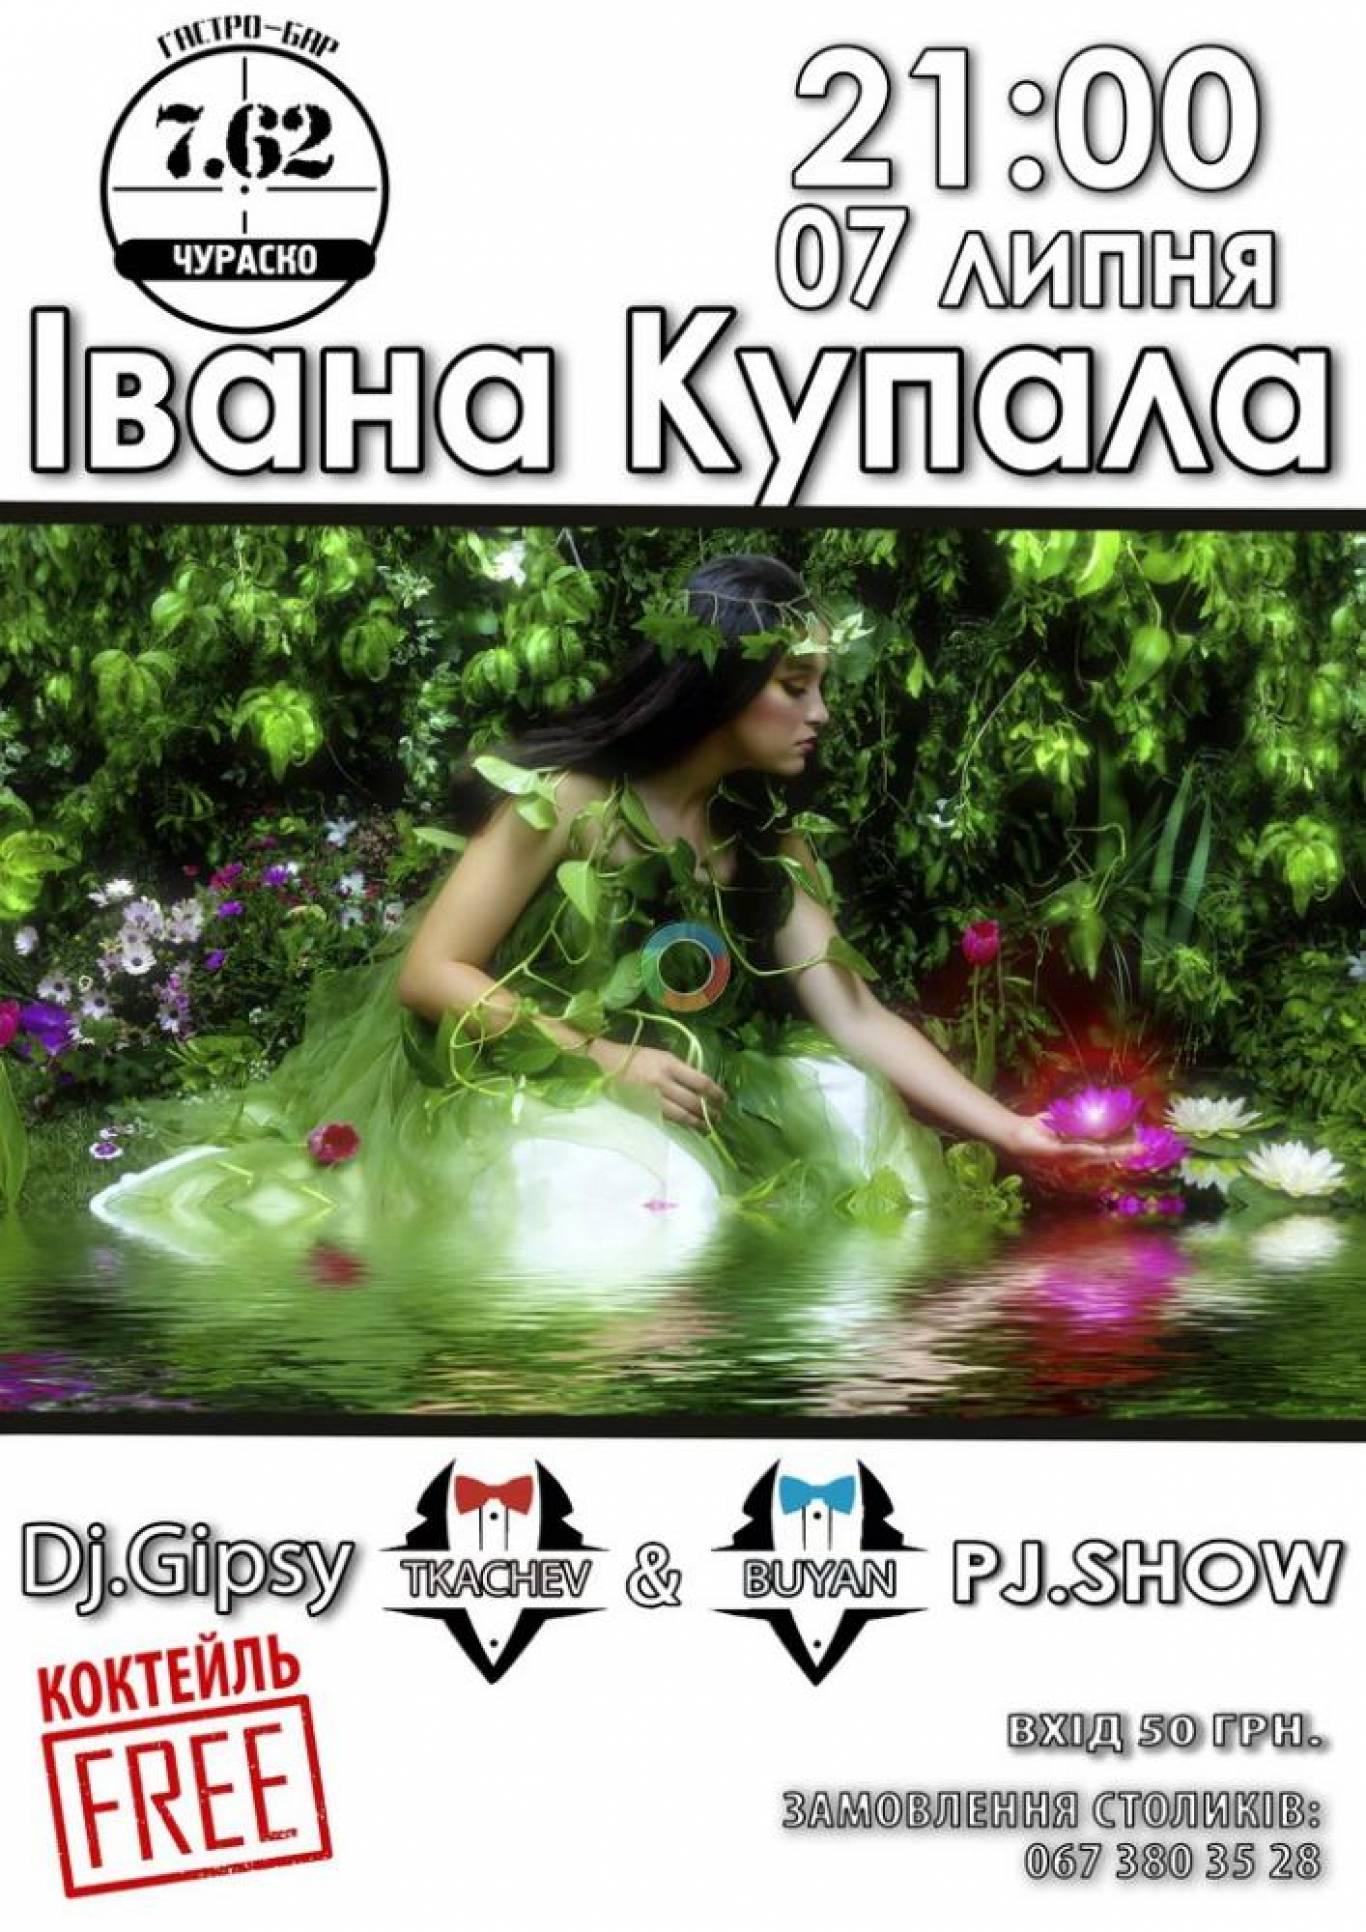 Весела вечірка Івана-Купала